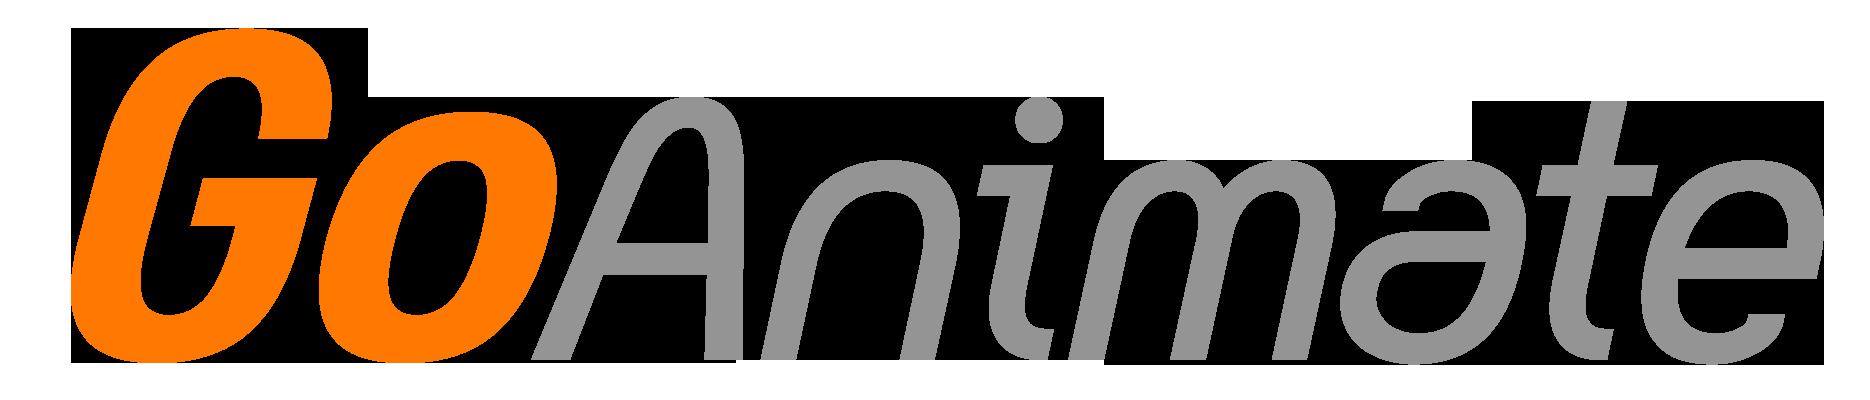 high_res_logo_notag_nomouse1.png